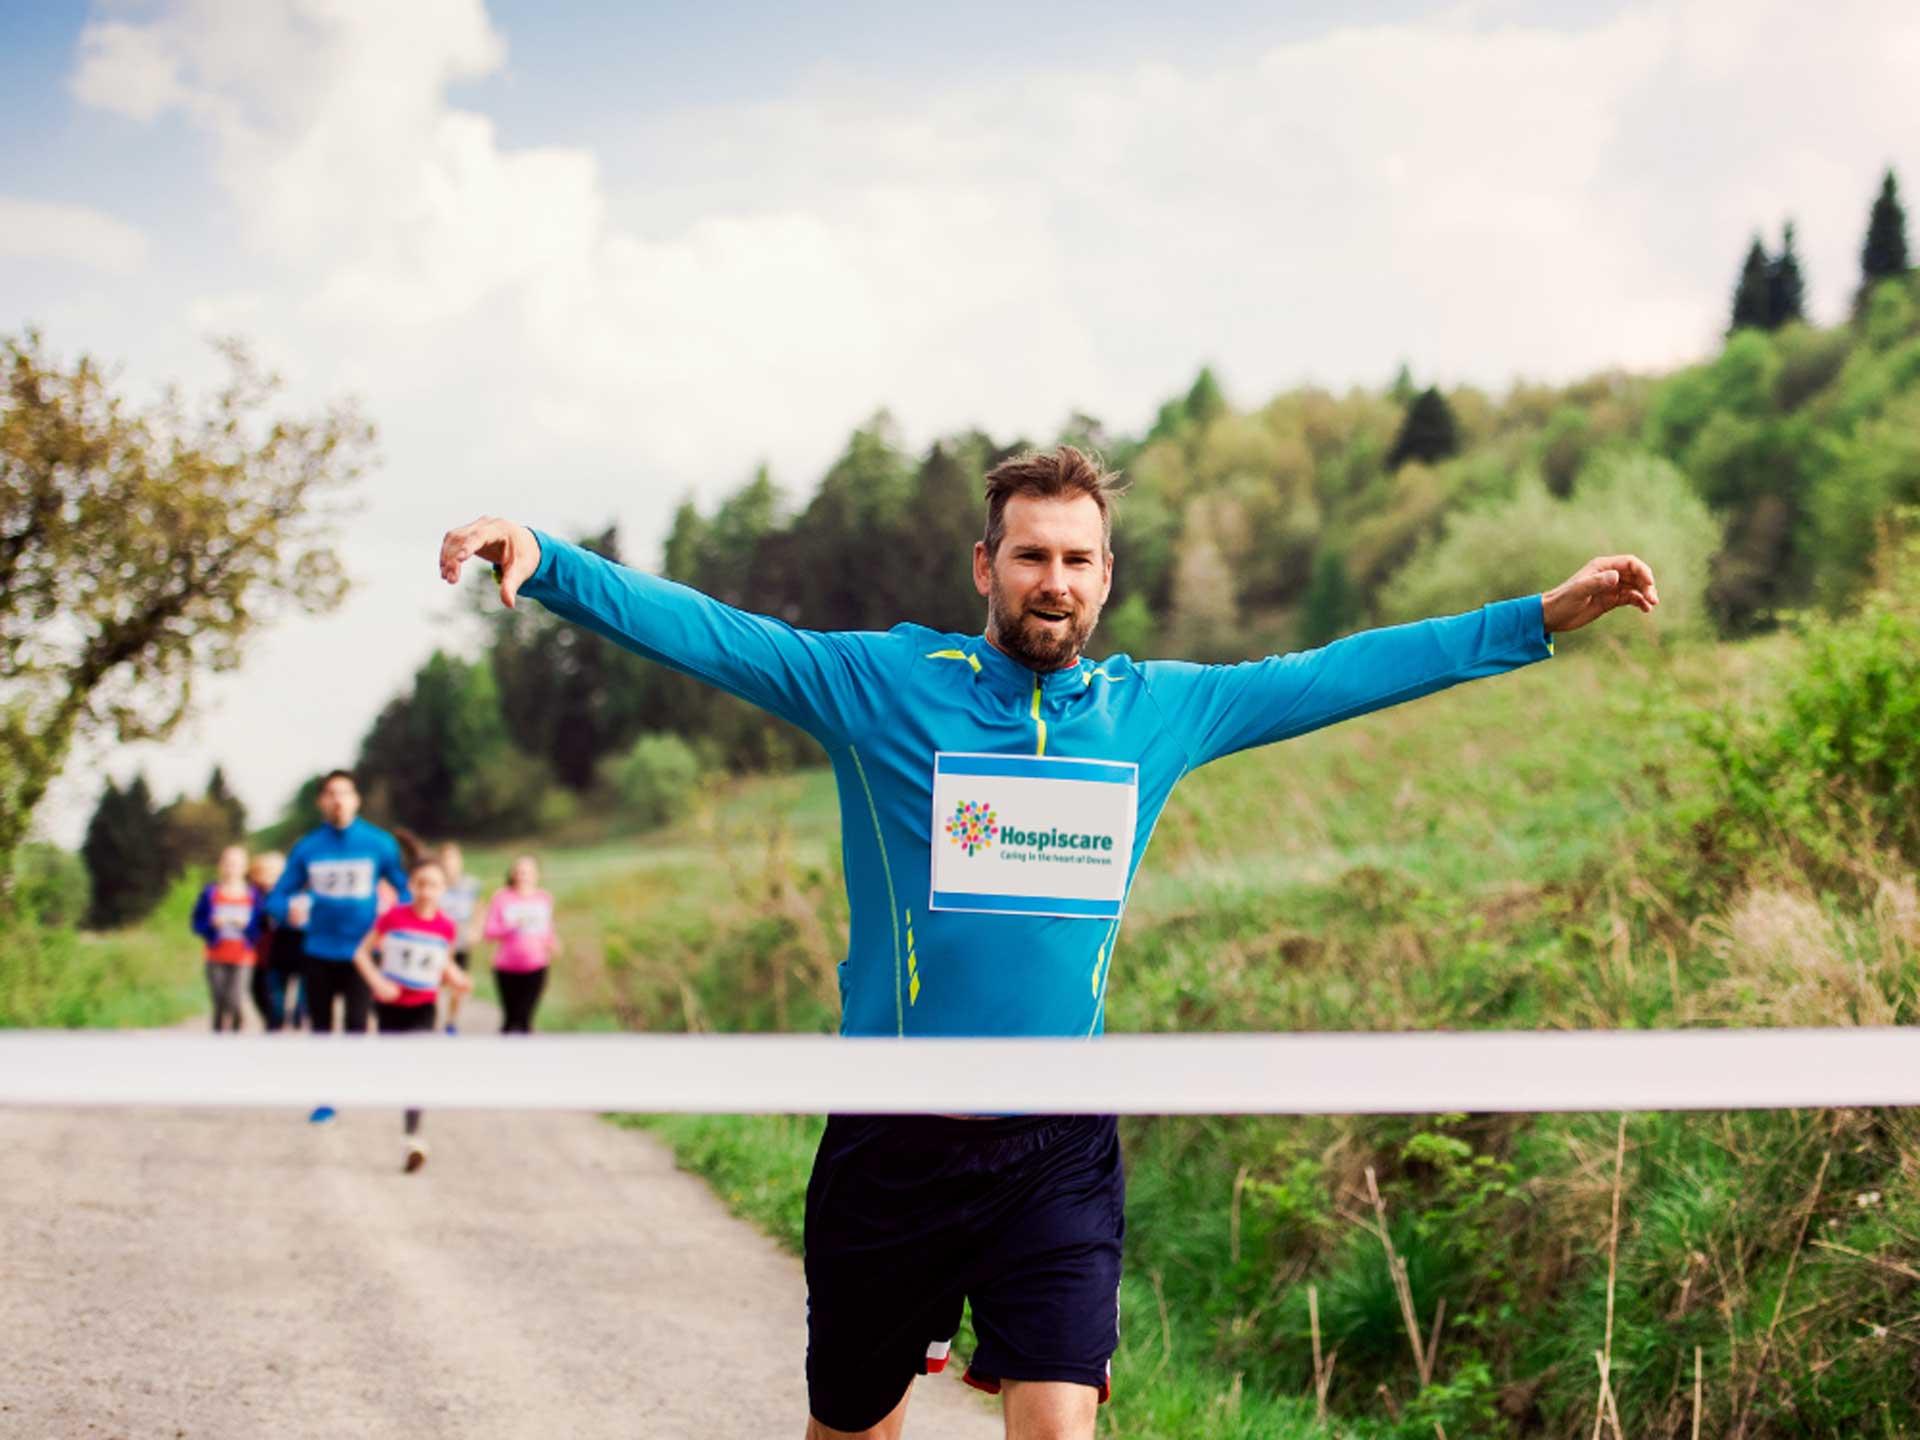 Walk, jog or run to support Hospiscare